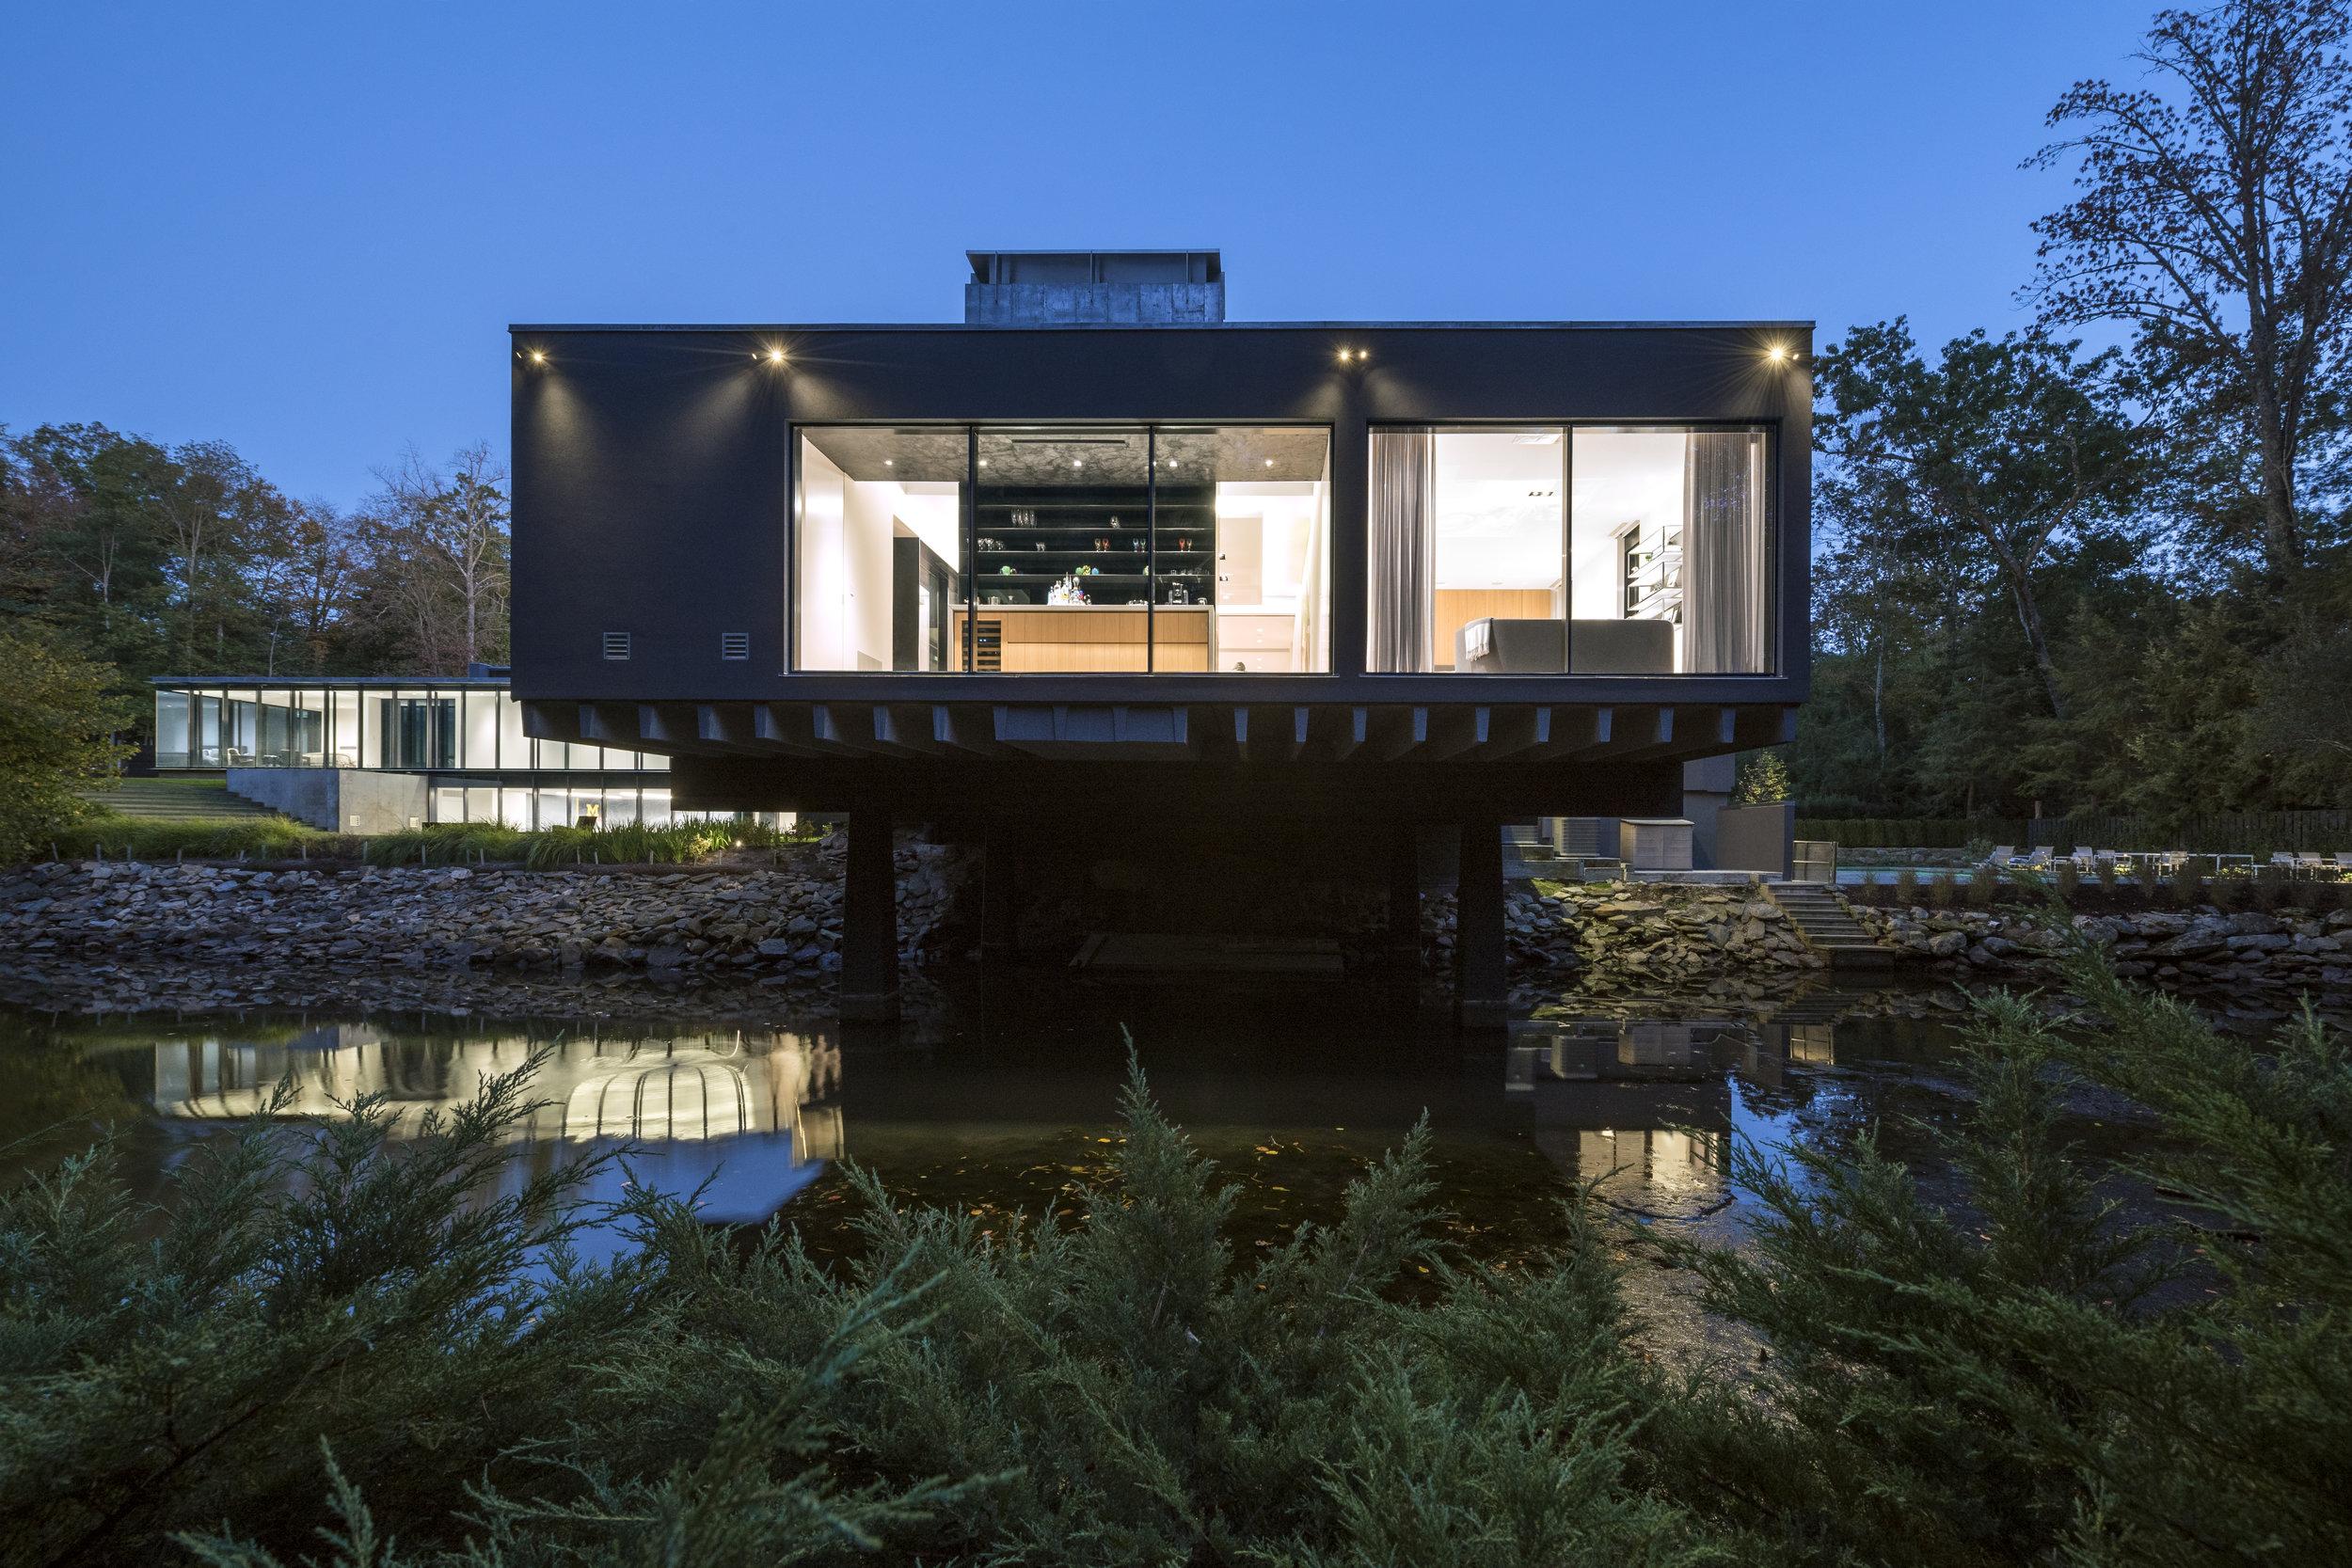 Gorgeous evening cantilever unique modern home